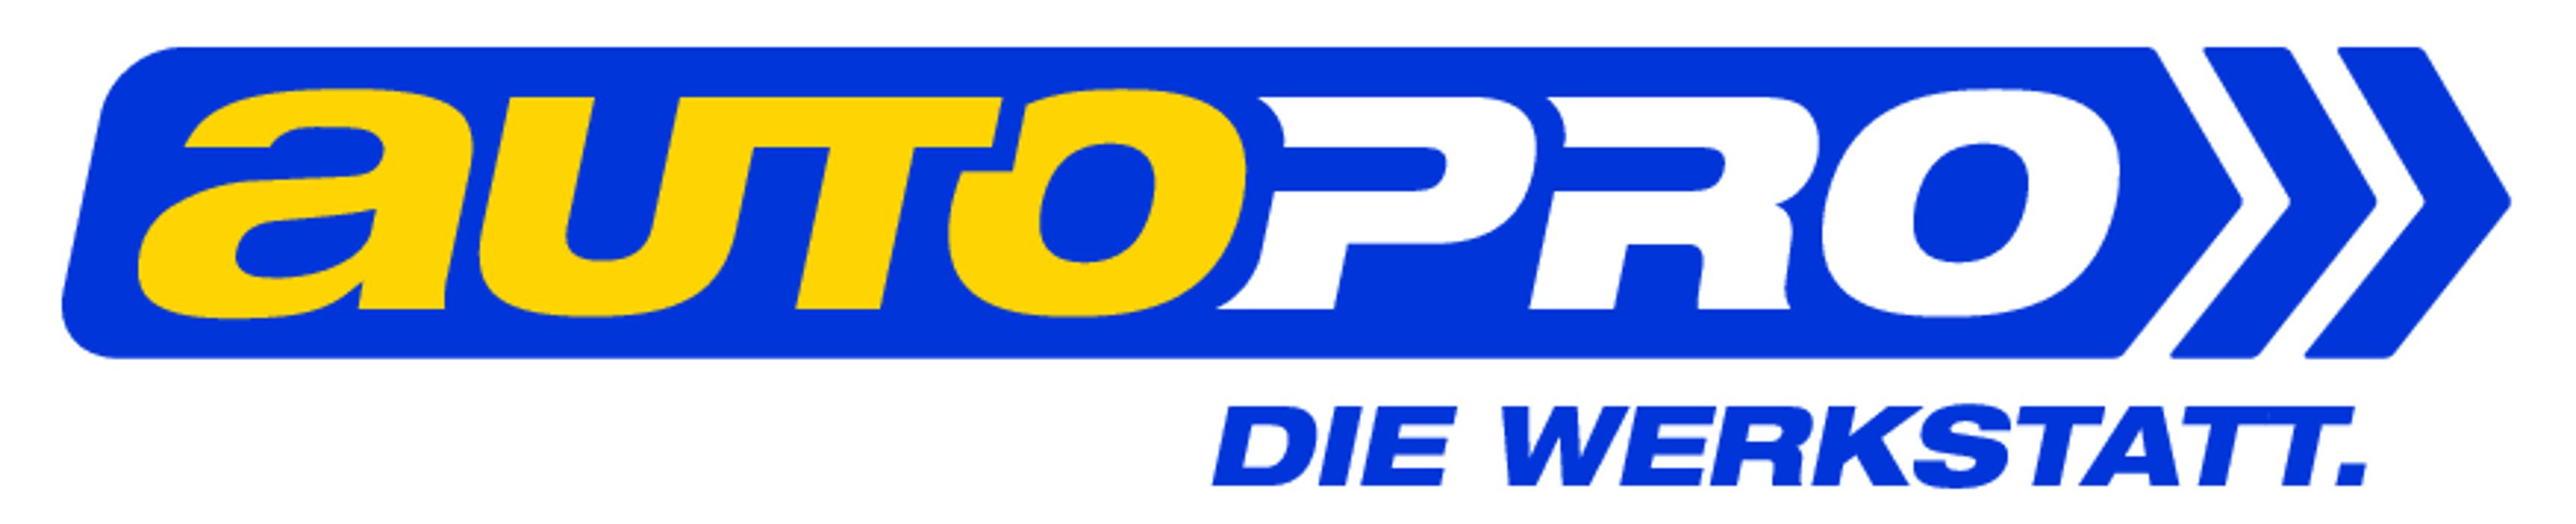 Bild zu KFZ-Meisterbetrieb Bendl in Vollersroda